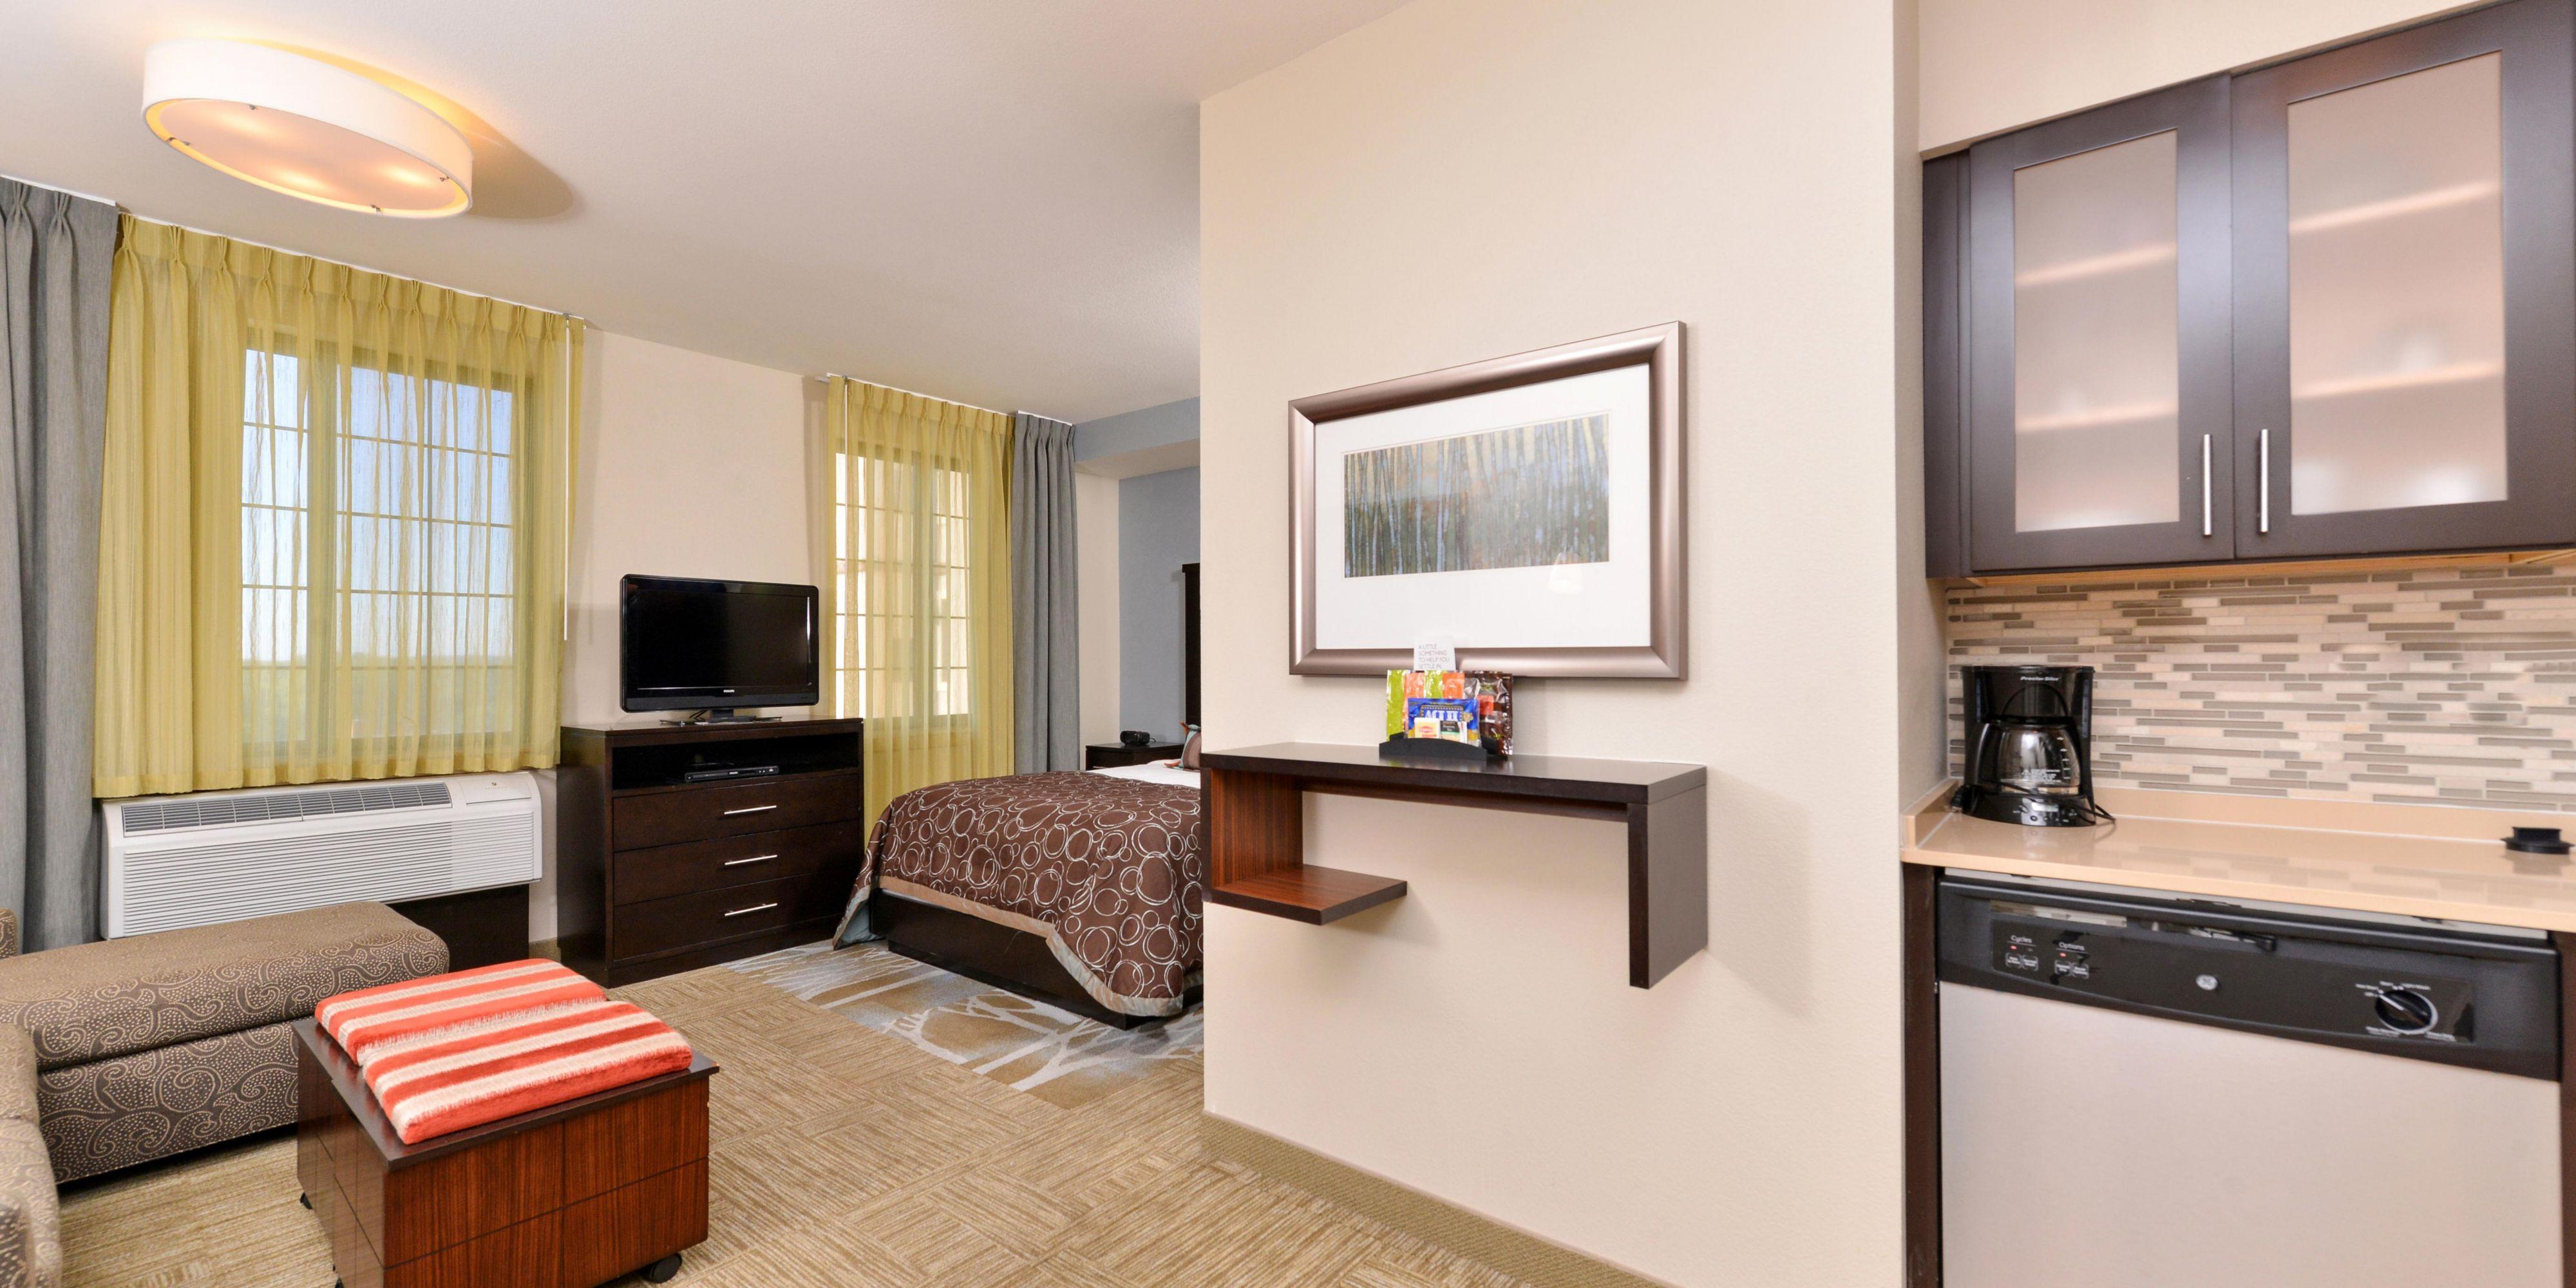 Staybridge Suites San Antonio - Stone Oak image 1